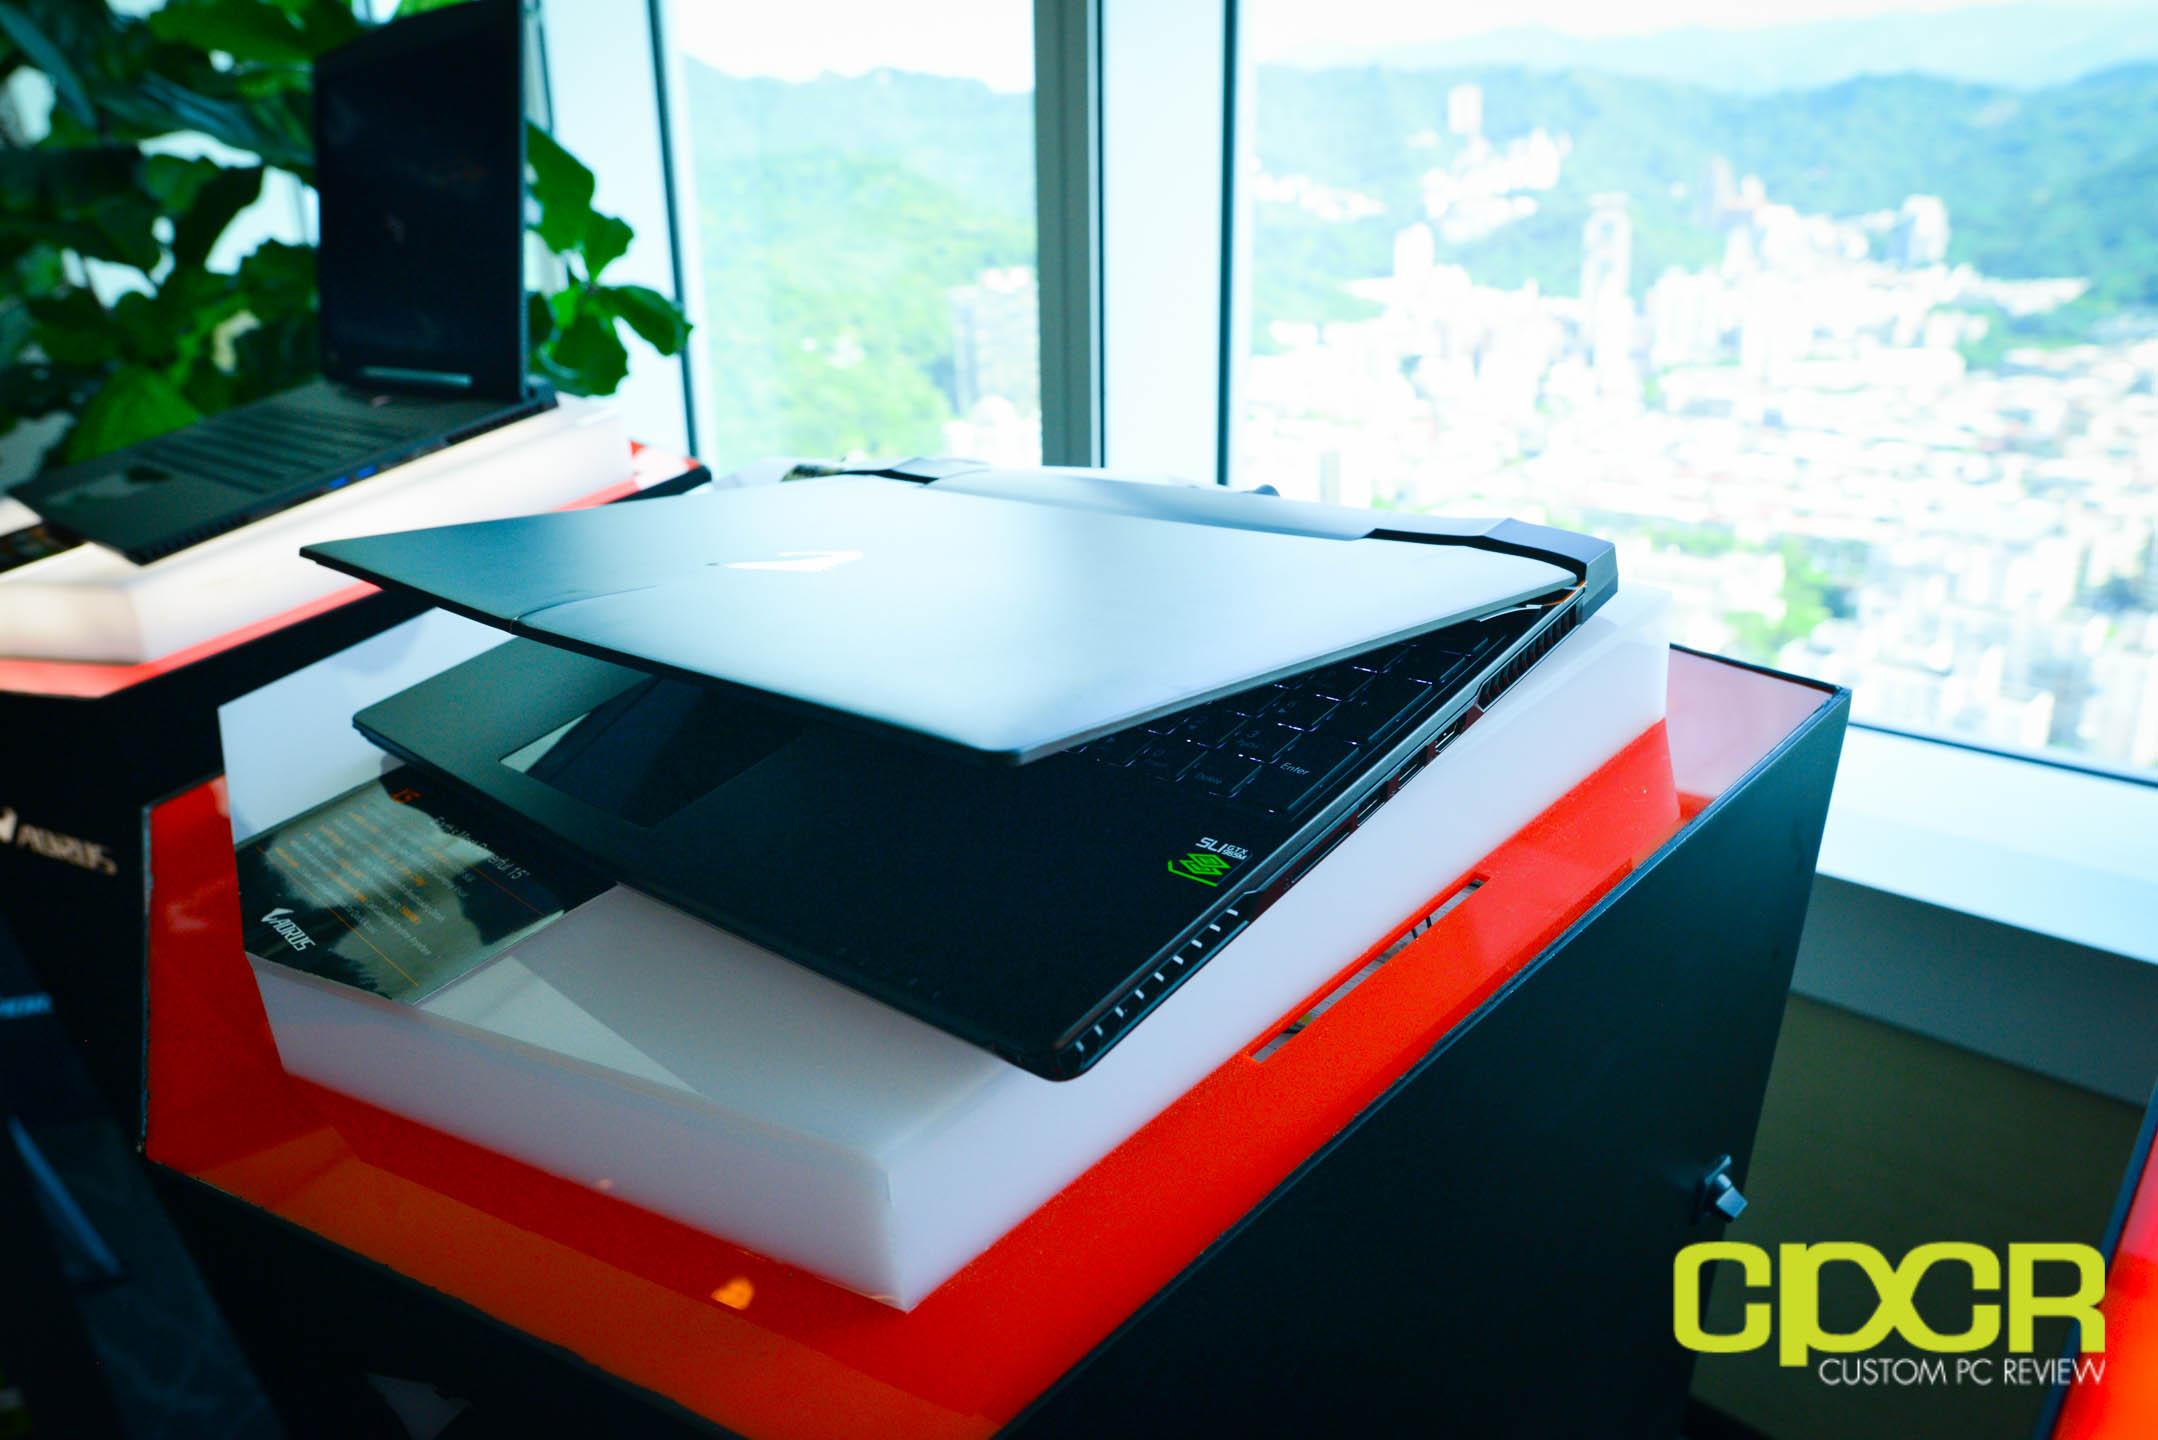 Computex 2015: Gigabyte Unveils Aorus X5 Gaming Laptop